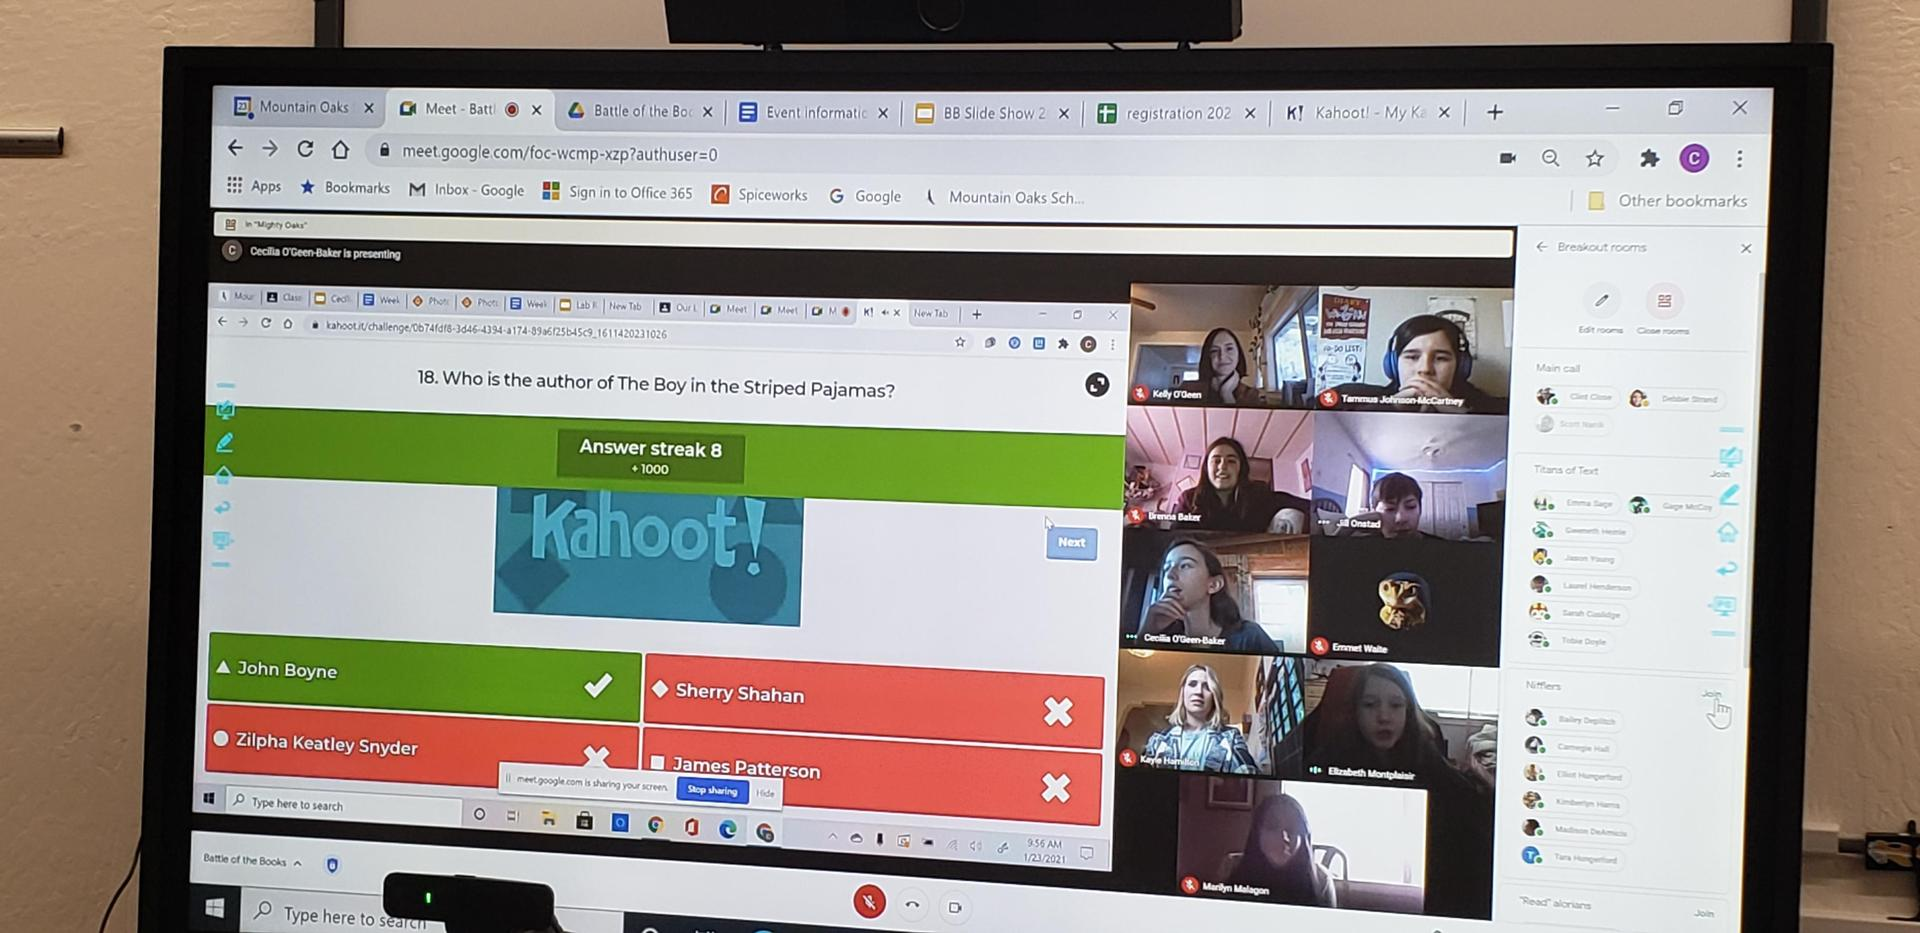 screenshot of virtual event